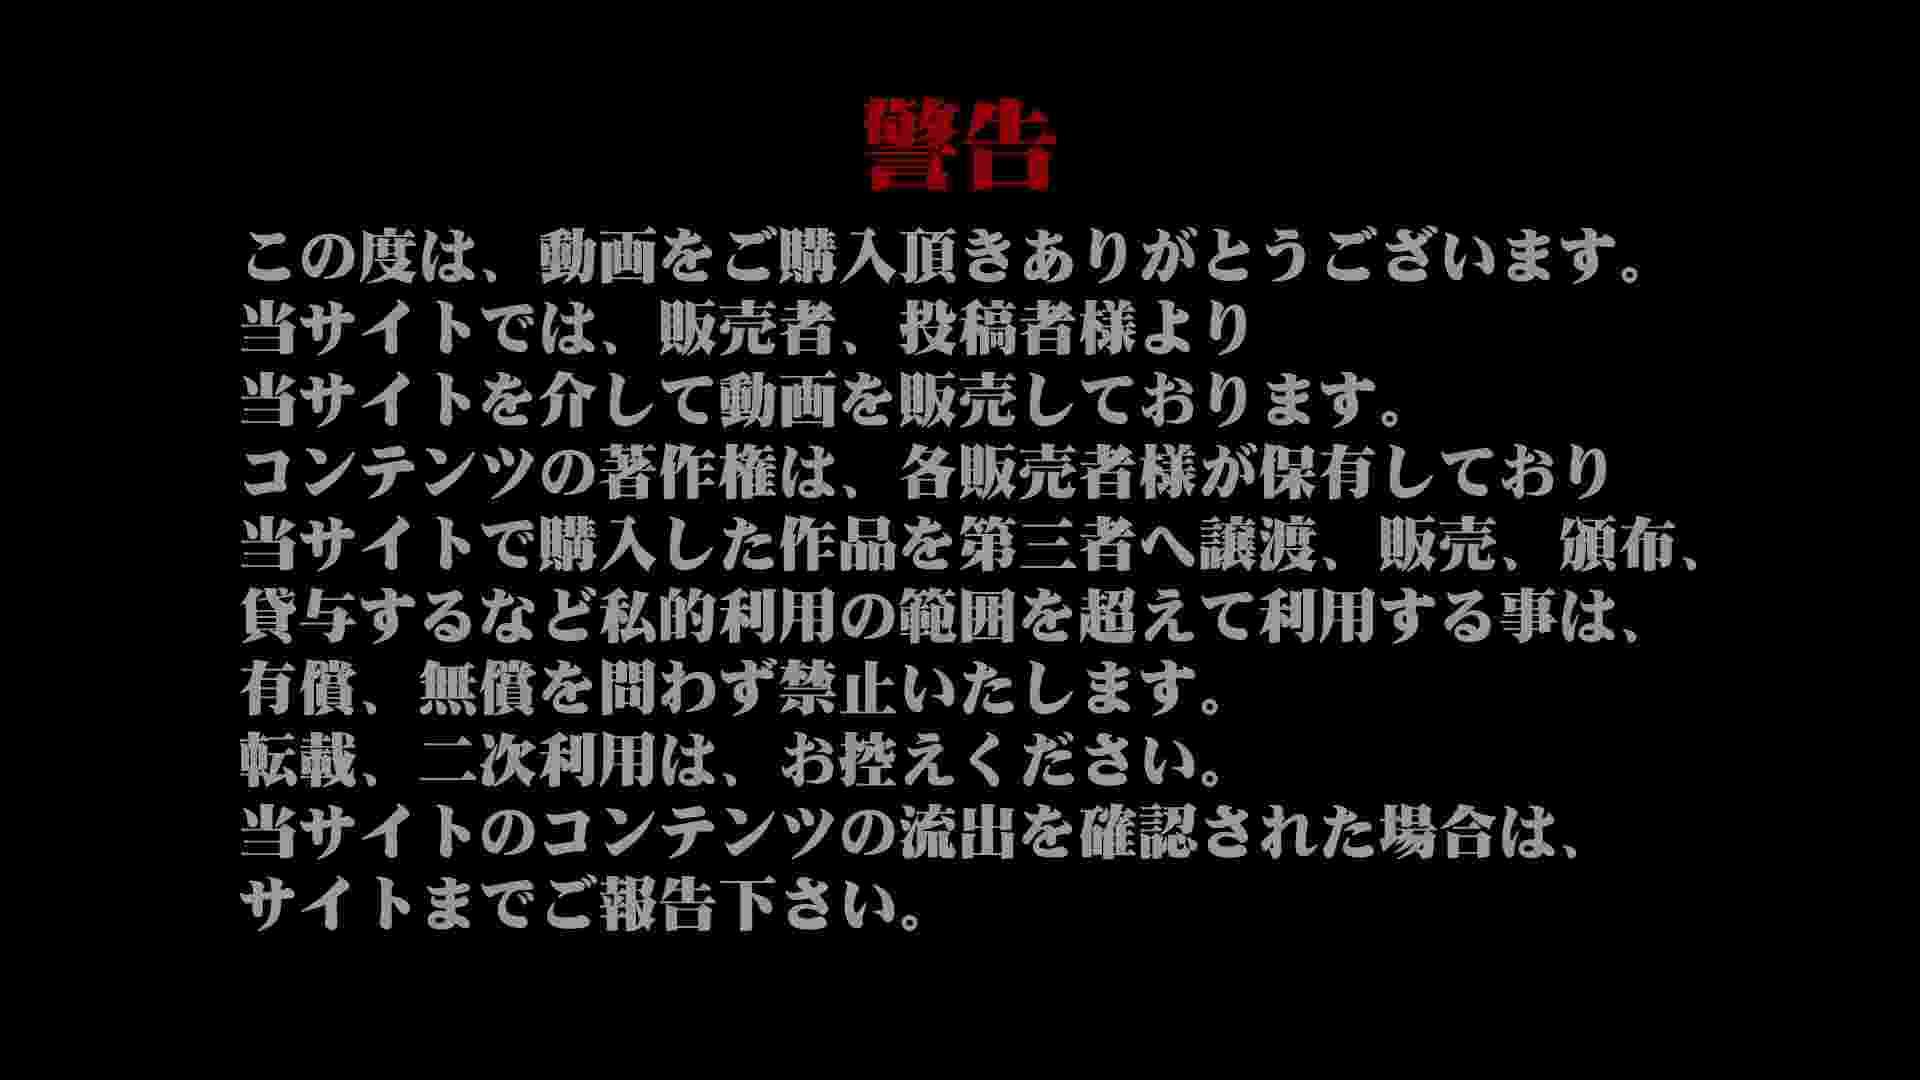 Aquaな露天風呂Vol.953 OLのエロ生活   露天風呂  107連発 1